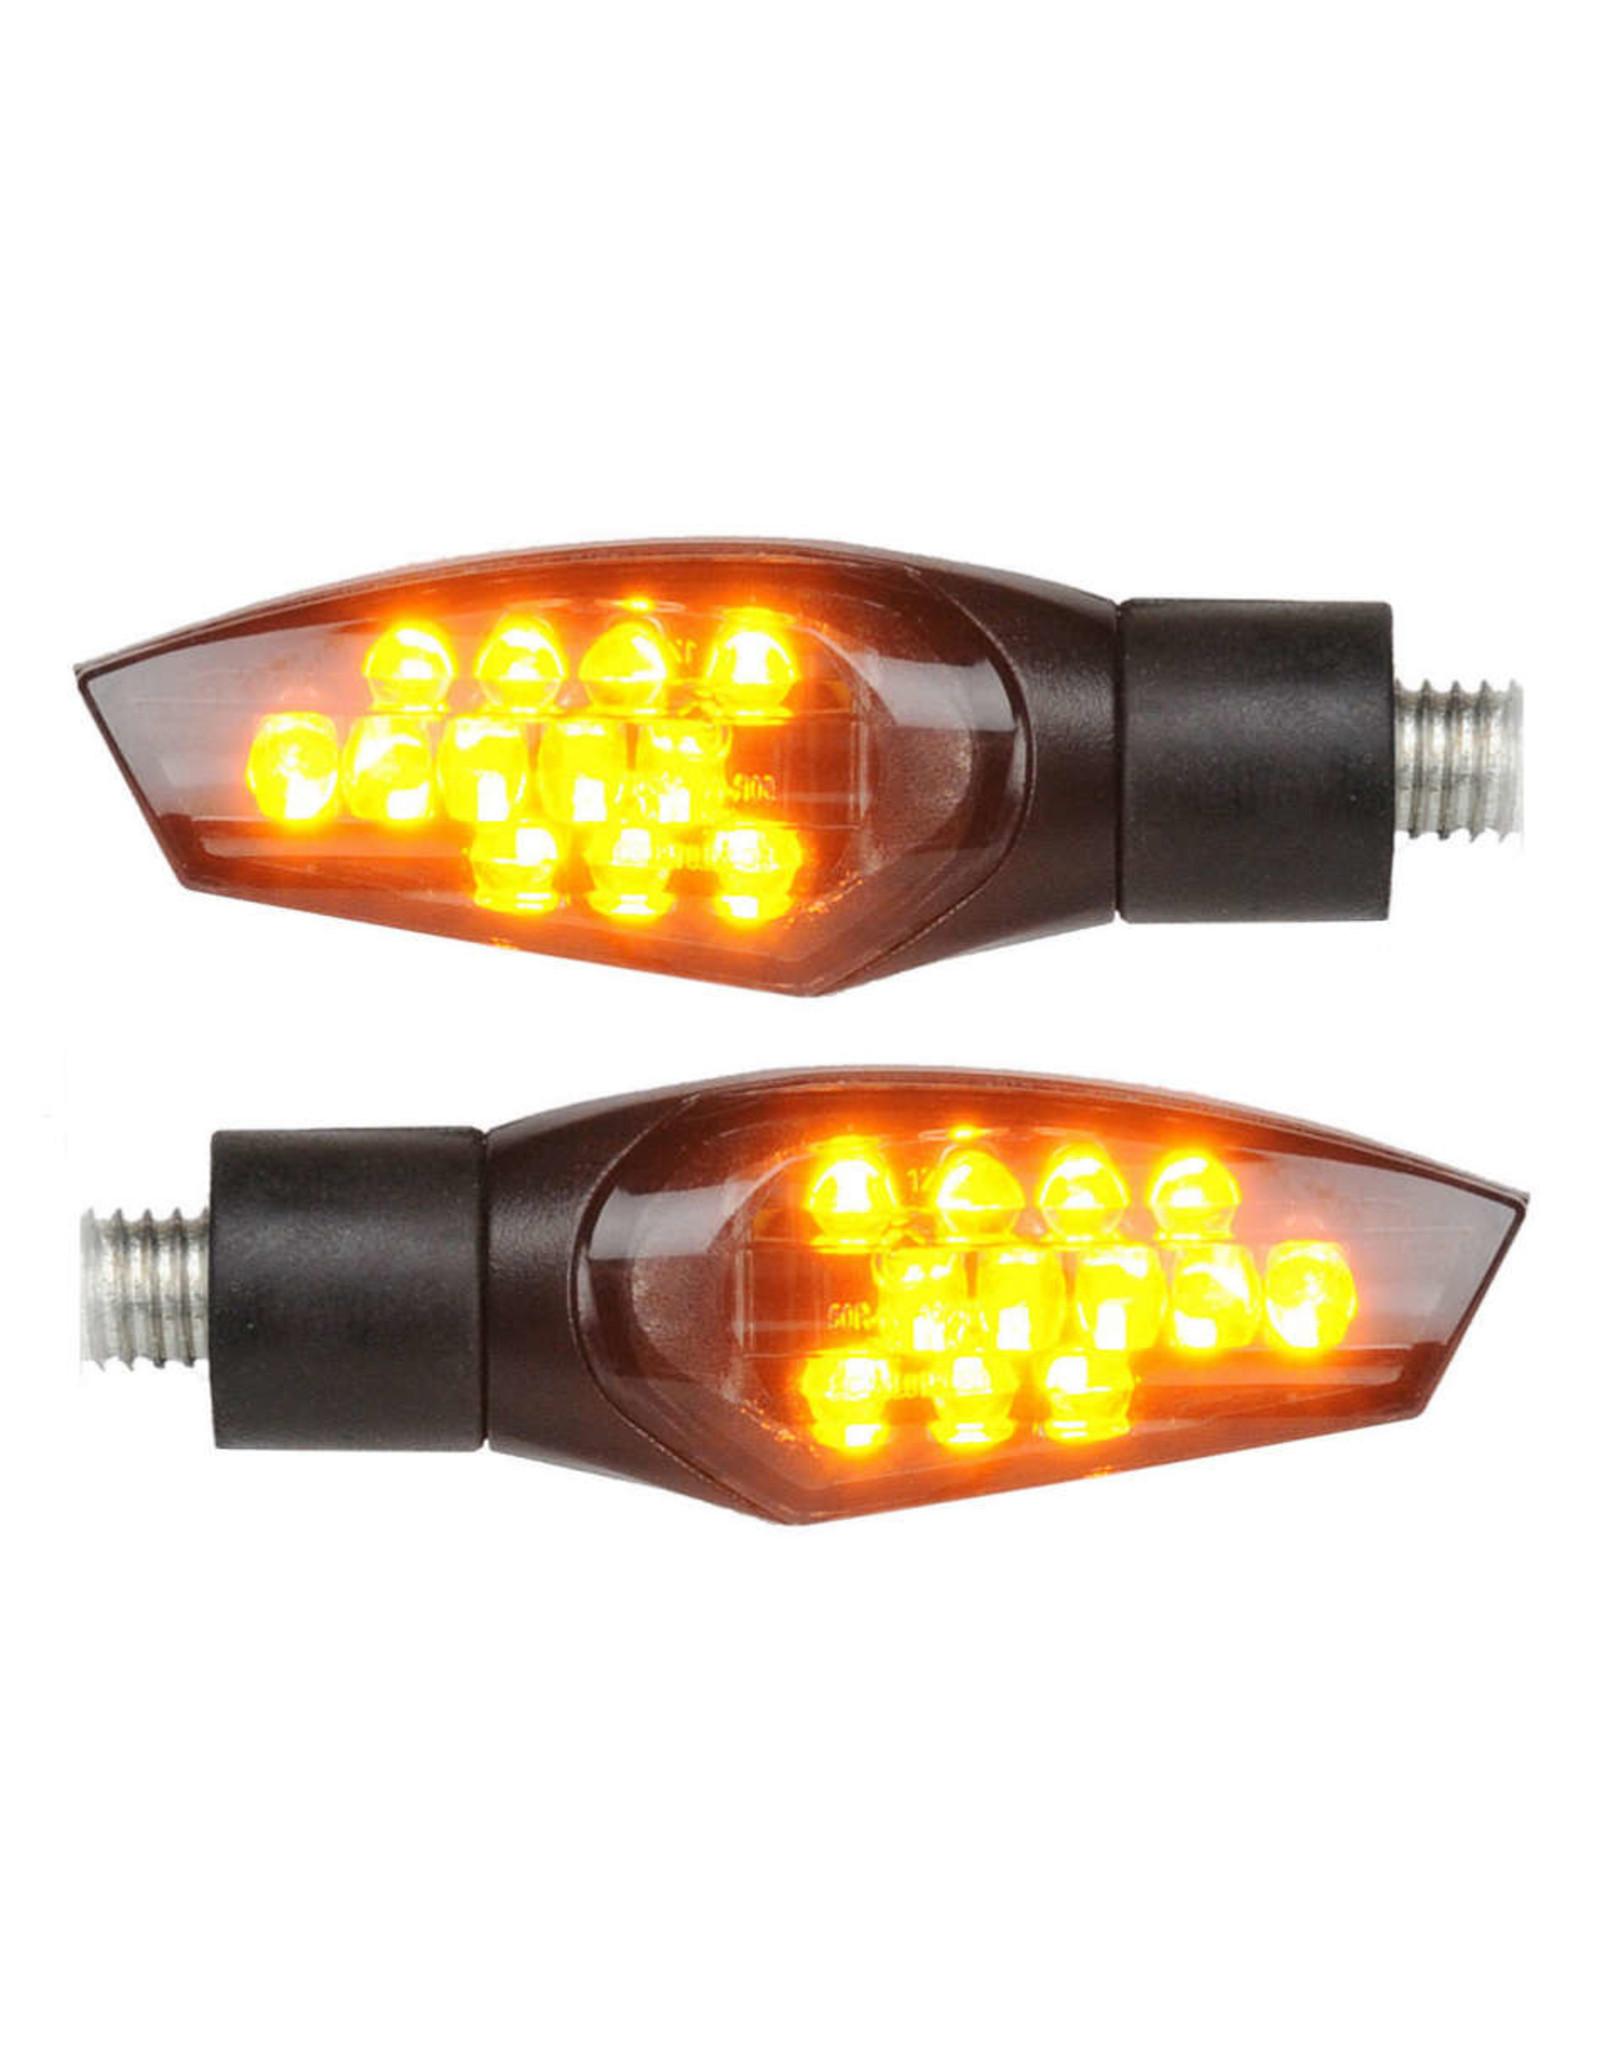 LIGHTECH LIGHTECH FRE911NER INDICATORS LED ABS BLACK UNIVERSAL